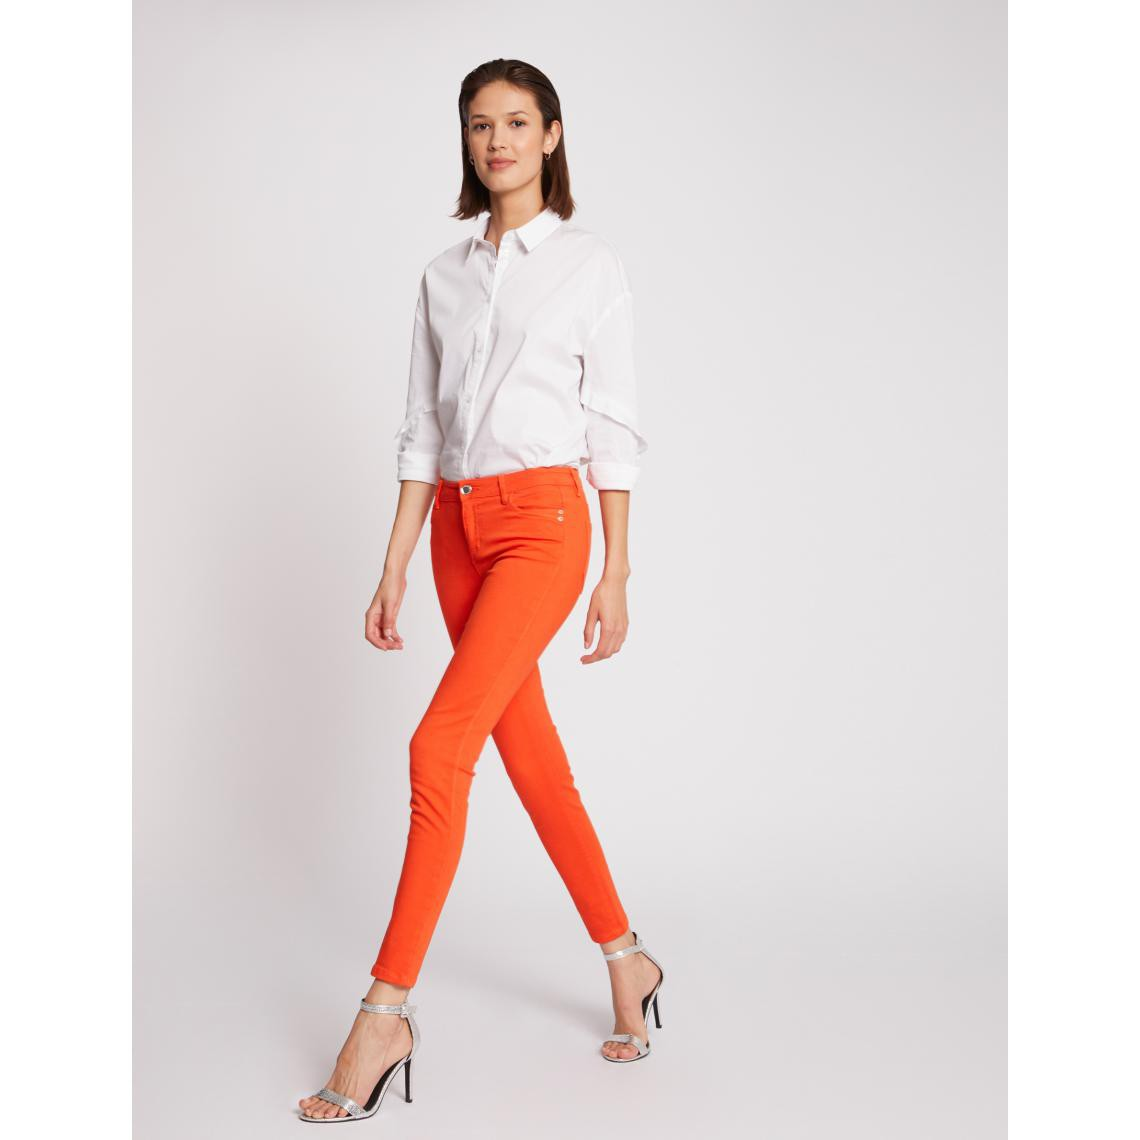 Pantalon droit taille standard PAxbk